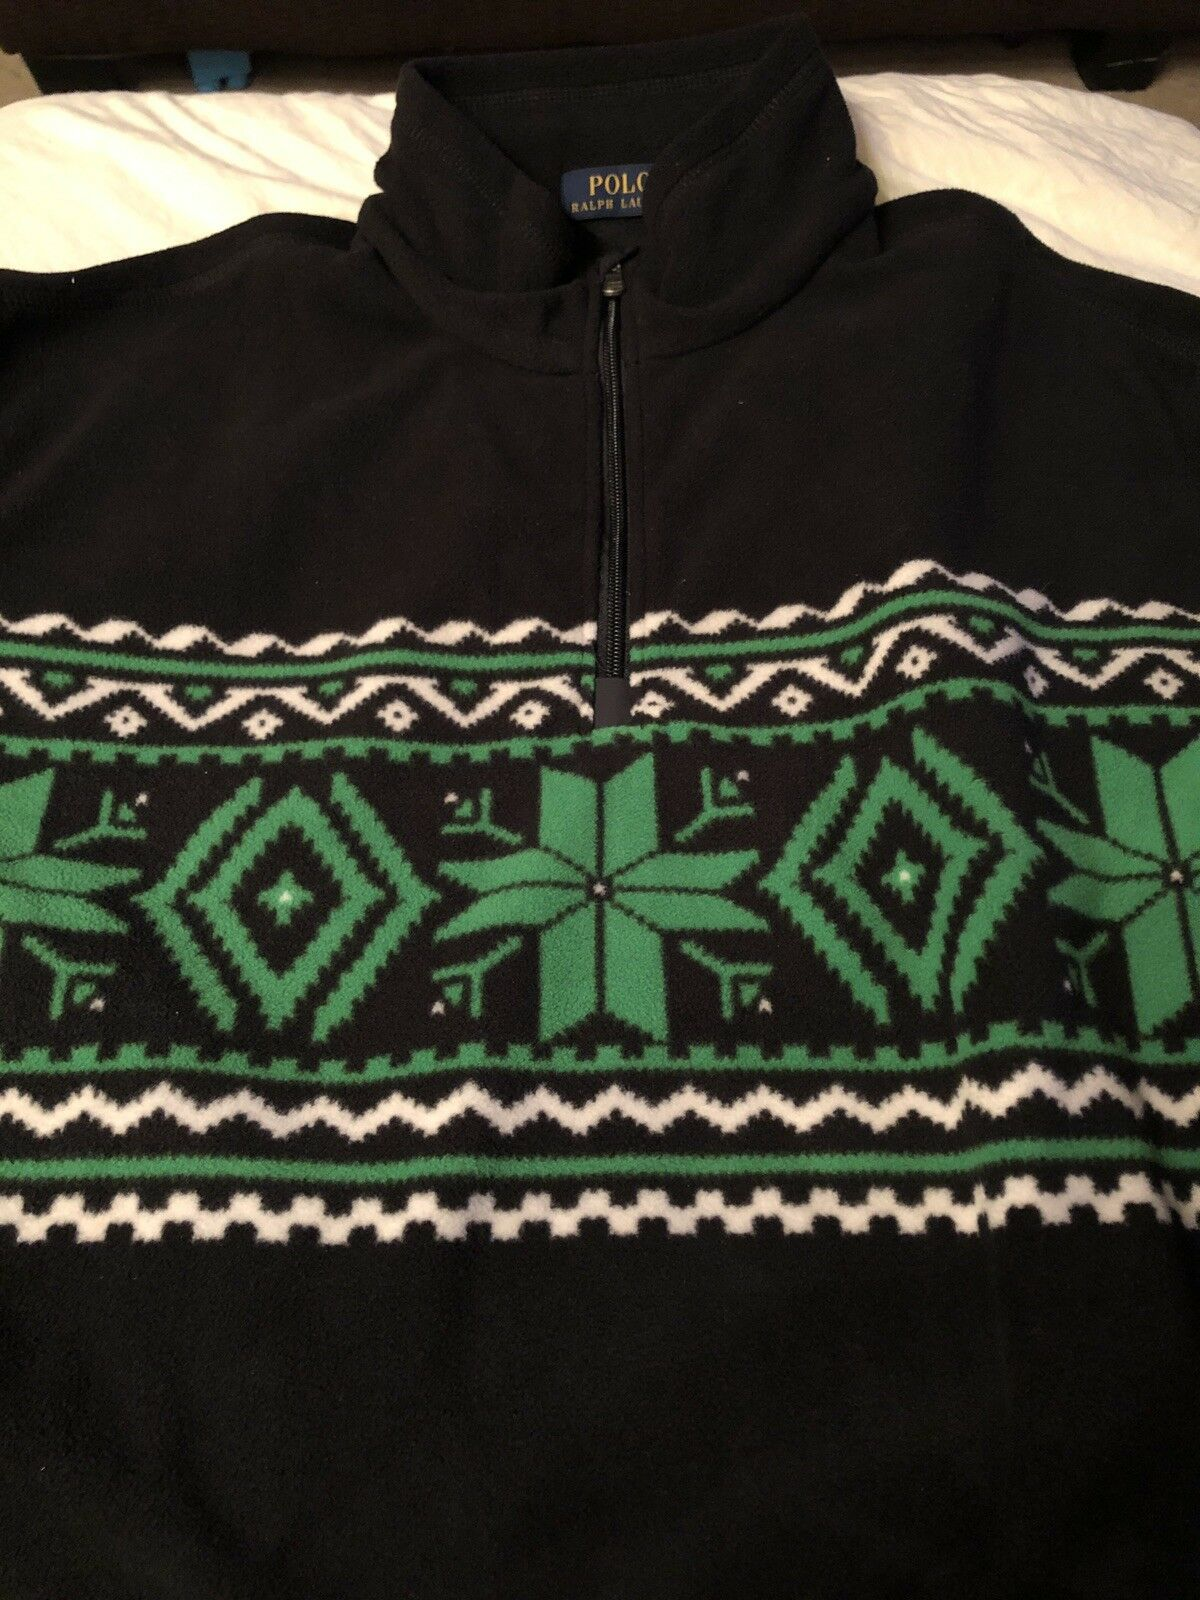 Polo Ralph Lauren Half Zip Fleece Pullover Christmas Holiday Winter 2XL XXL 202